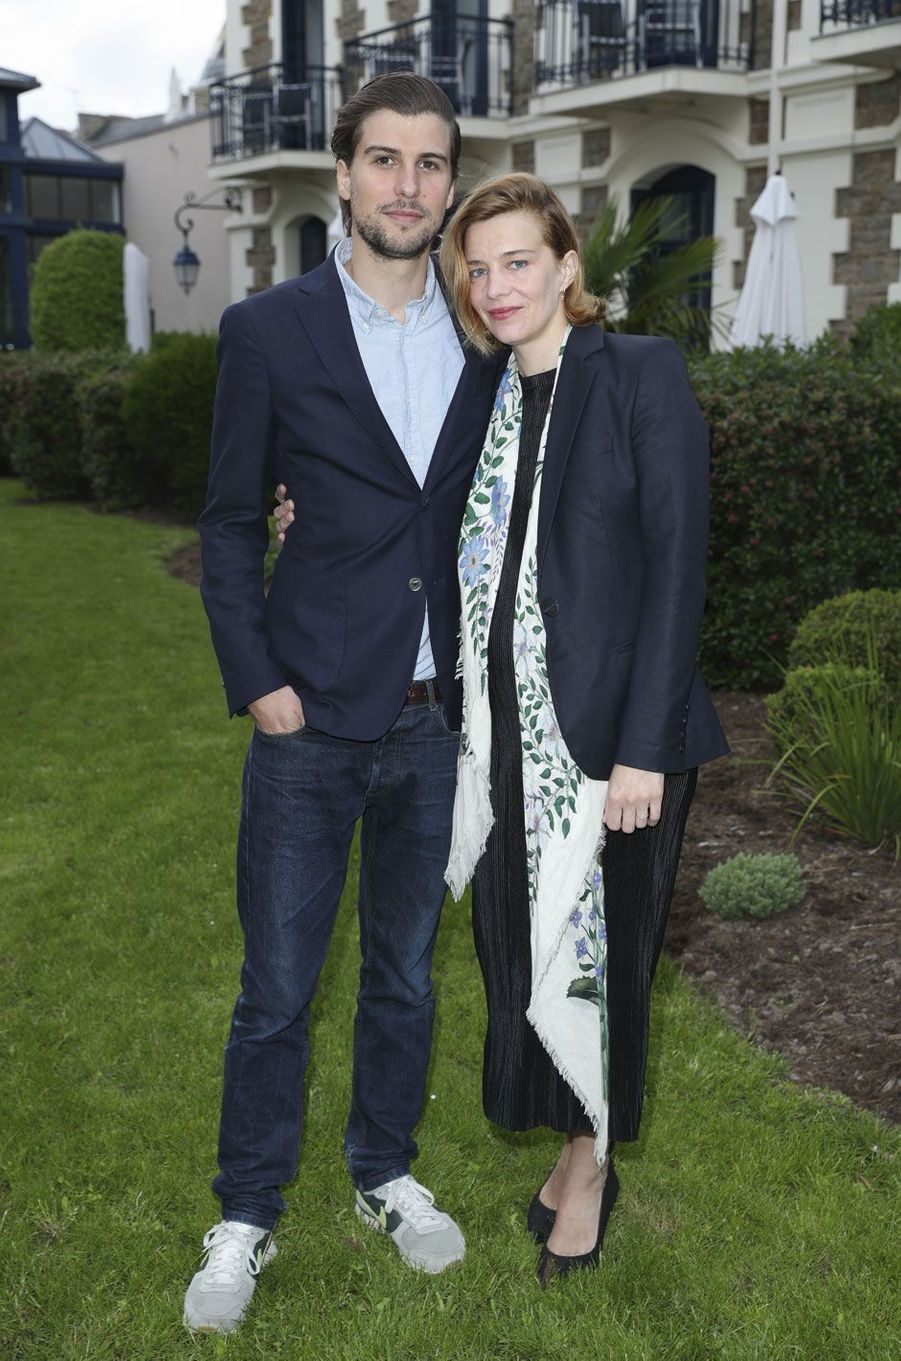 Philibert Dechelette et Céline Sallette.